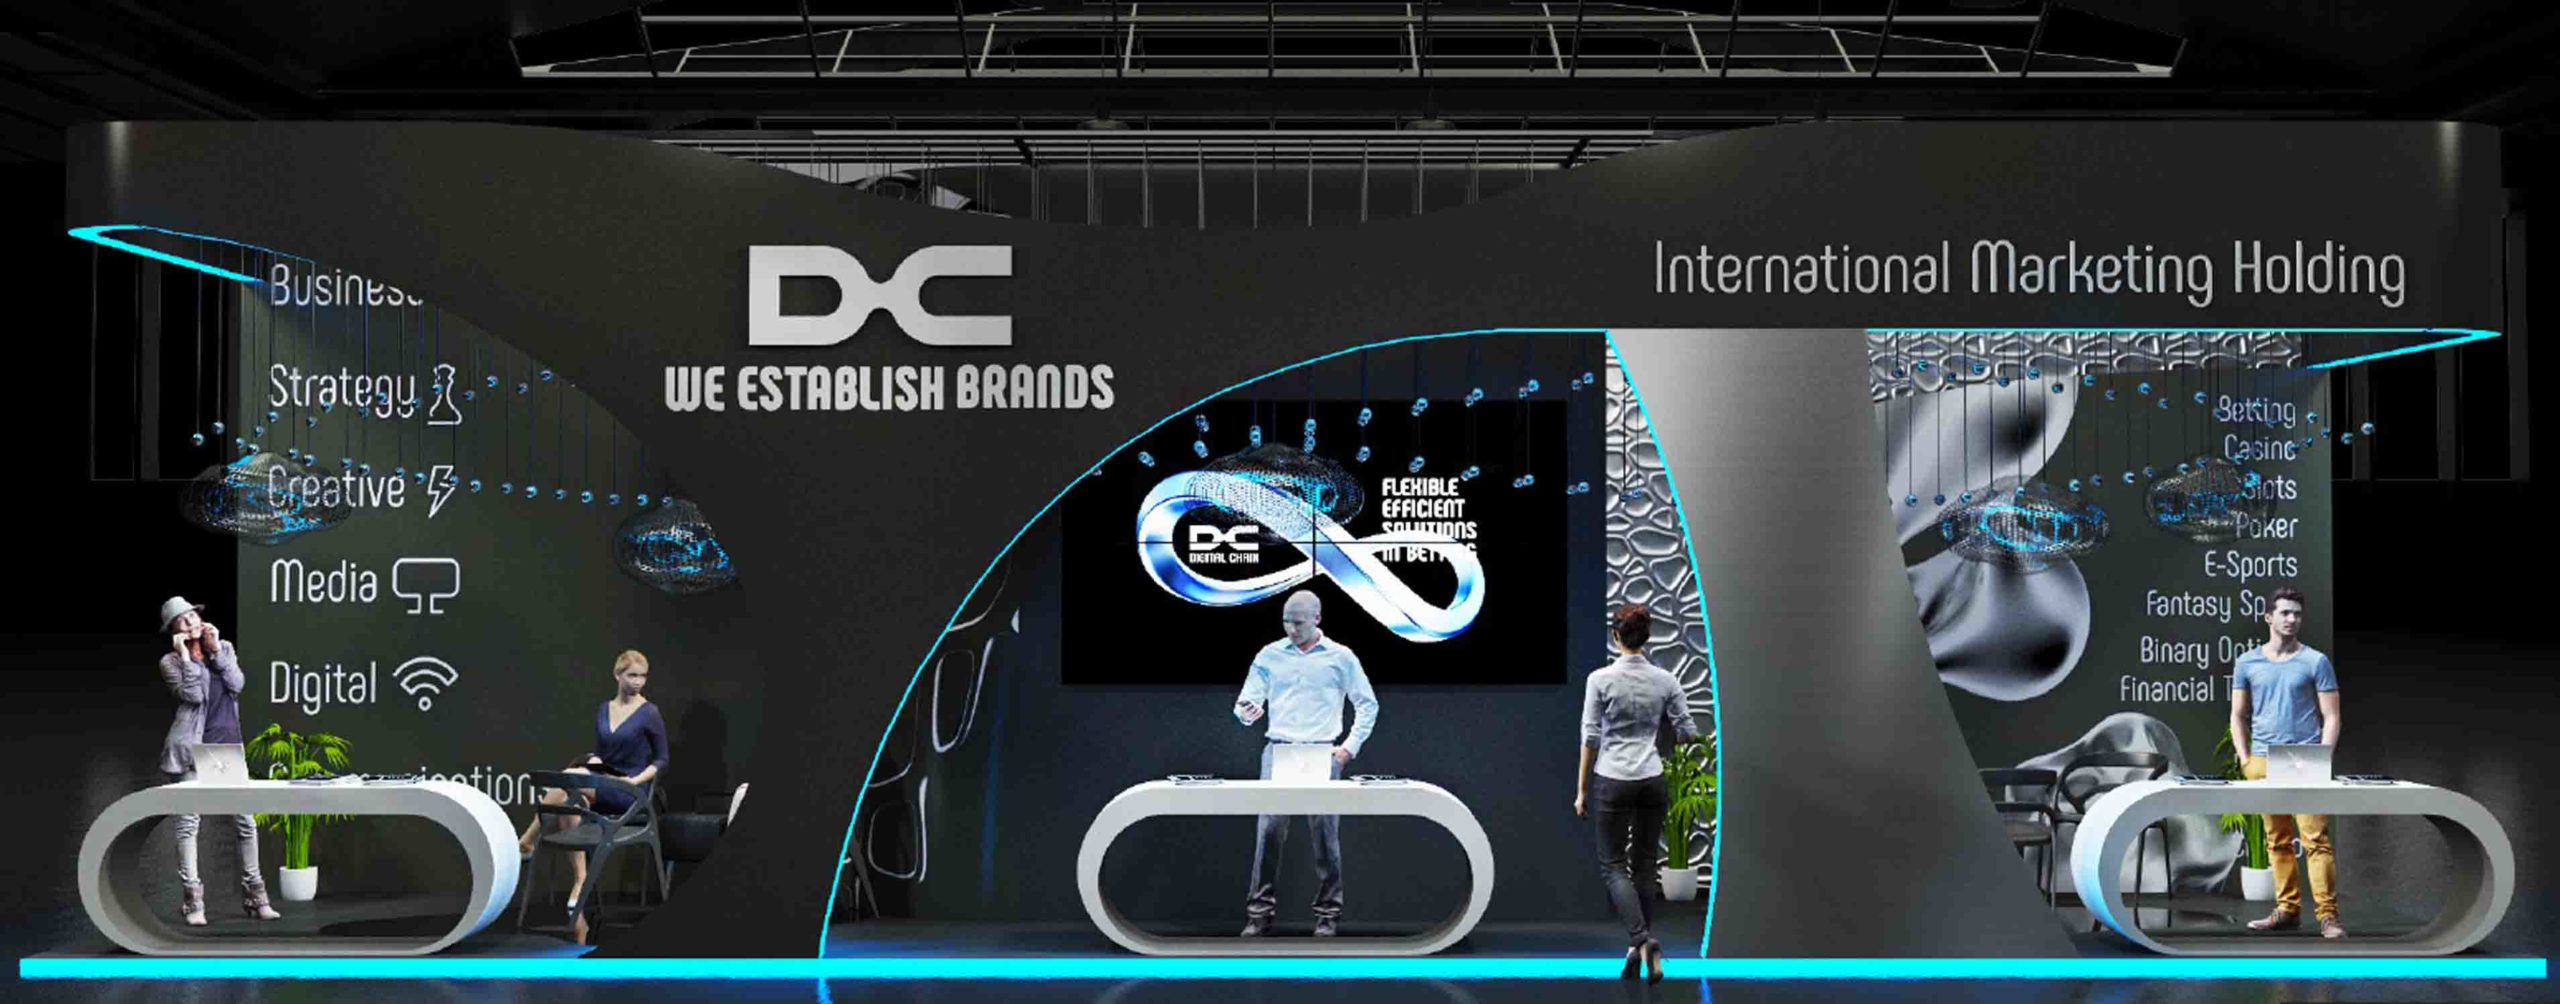 Digital Chain exhibition stand